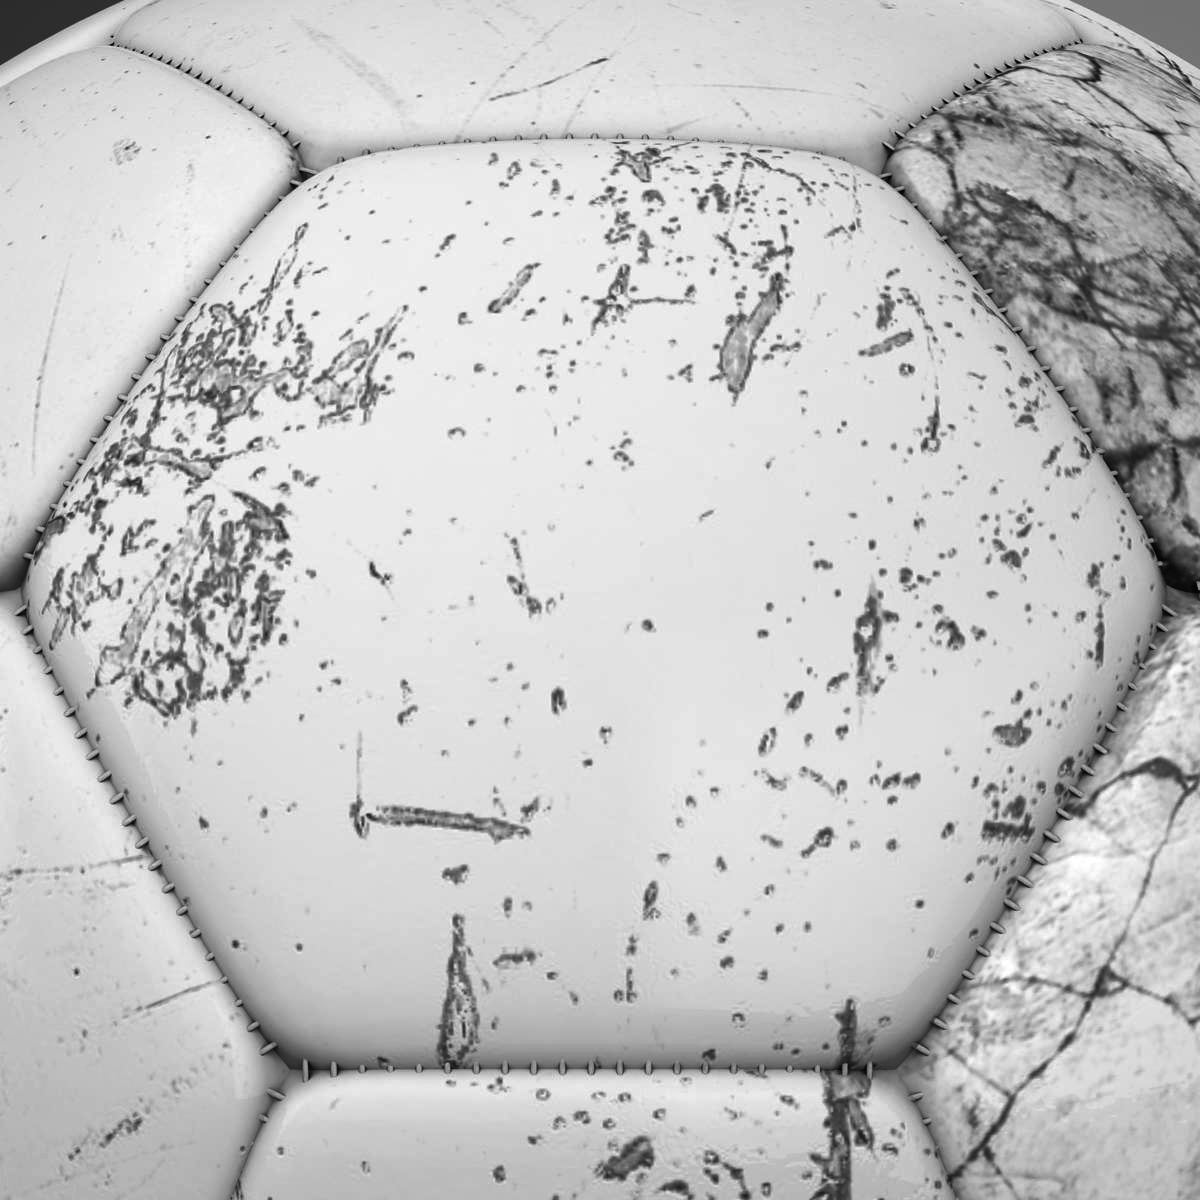 soccerball цагаан 3d загвар 3ds max fbx c4d ma mb obj 205185